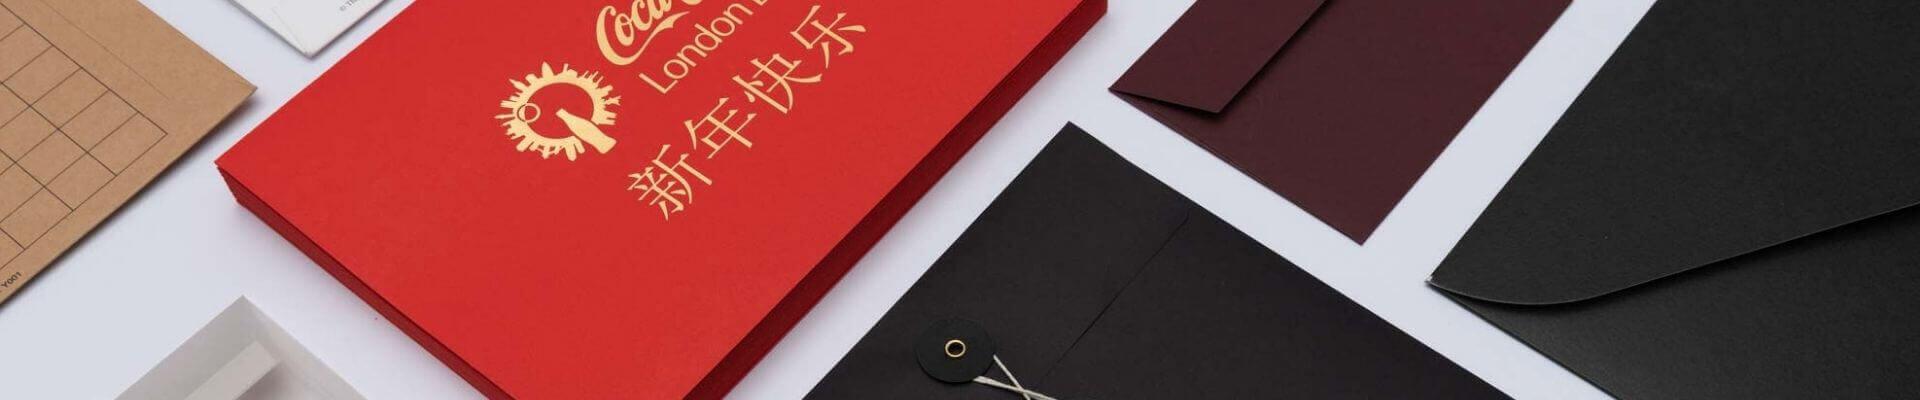 Personalisation - Material